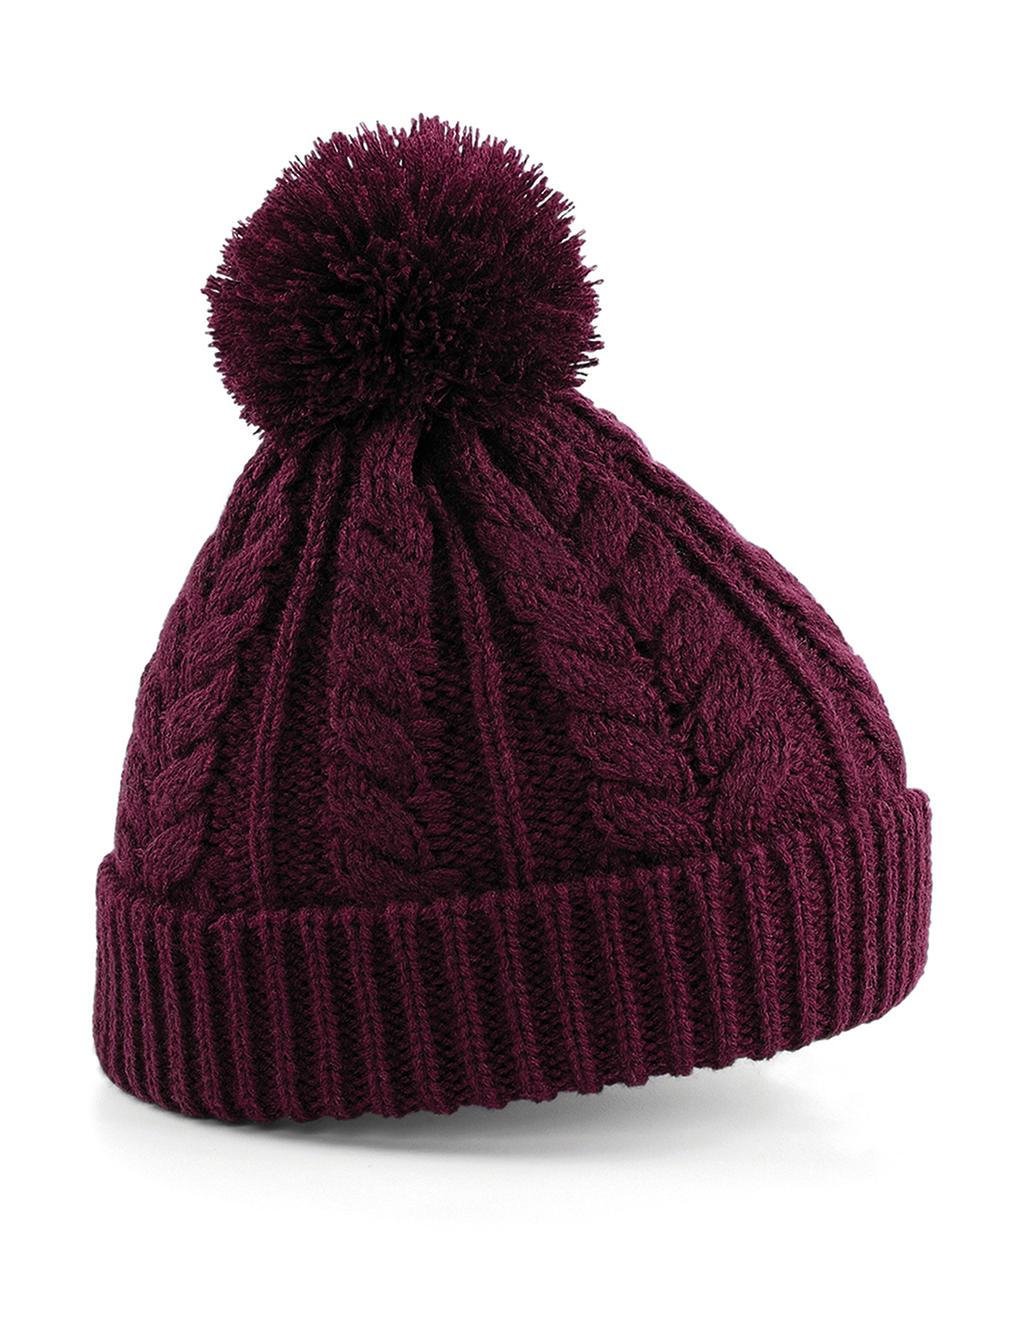 Èepice Knit Snowstar Beanie - zvìtšit obrázek